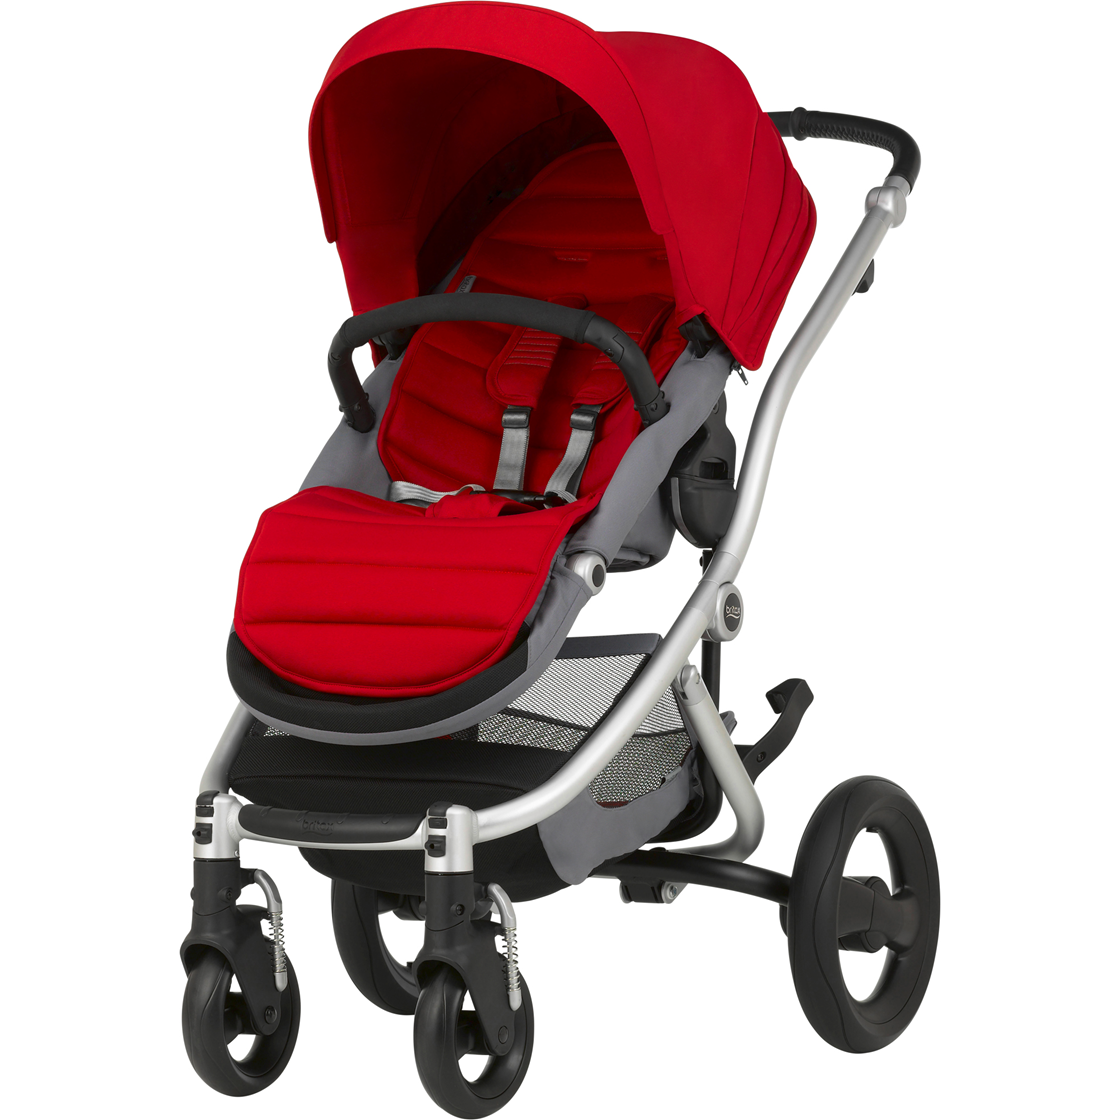 Carro bebé Britax Affinity 2 Baby Stroller